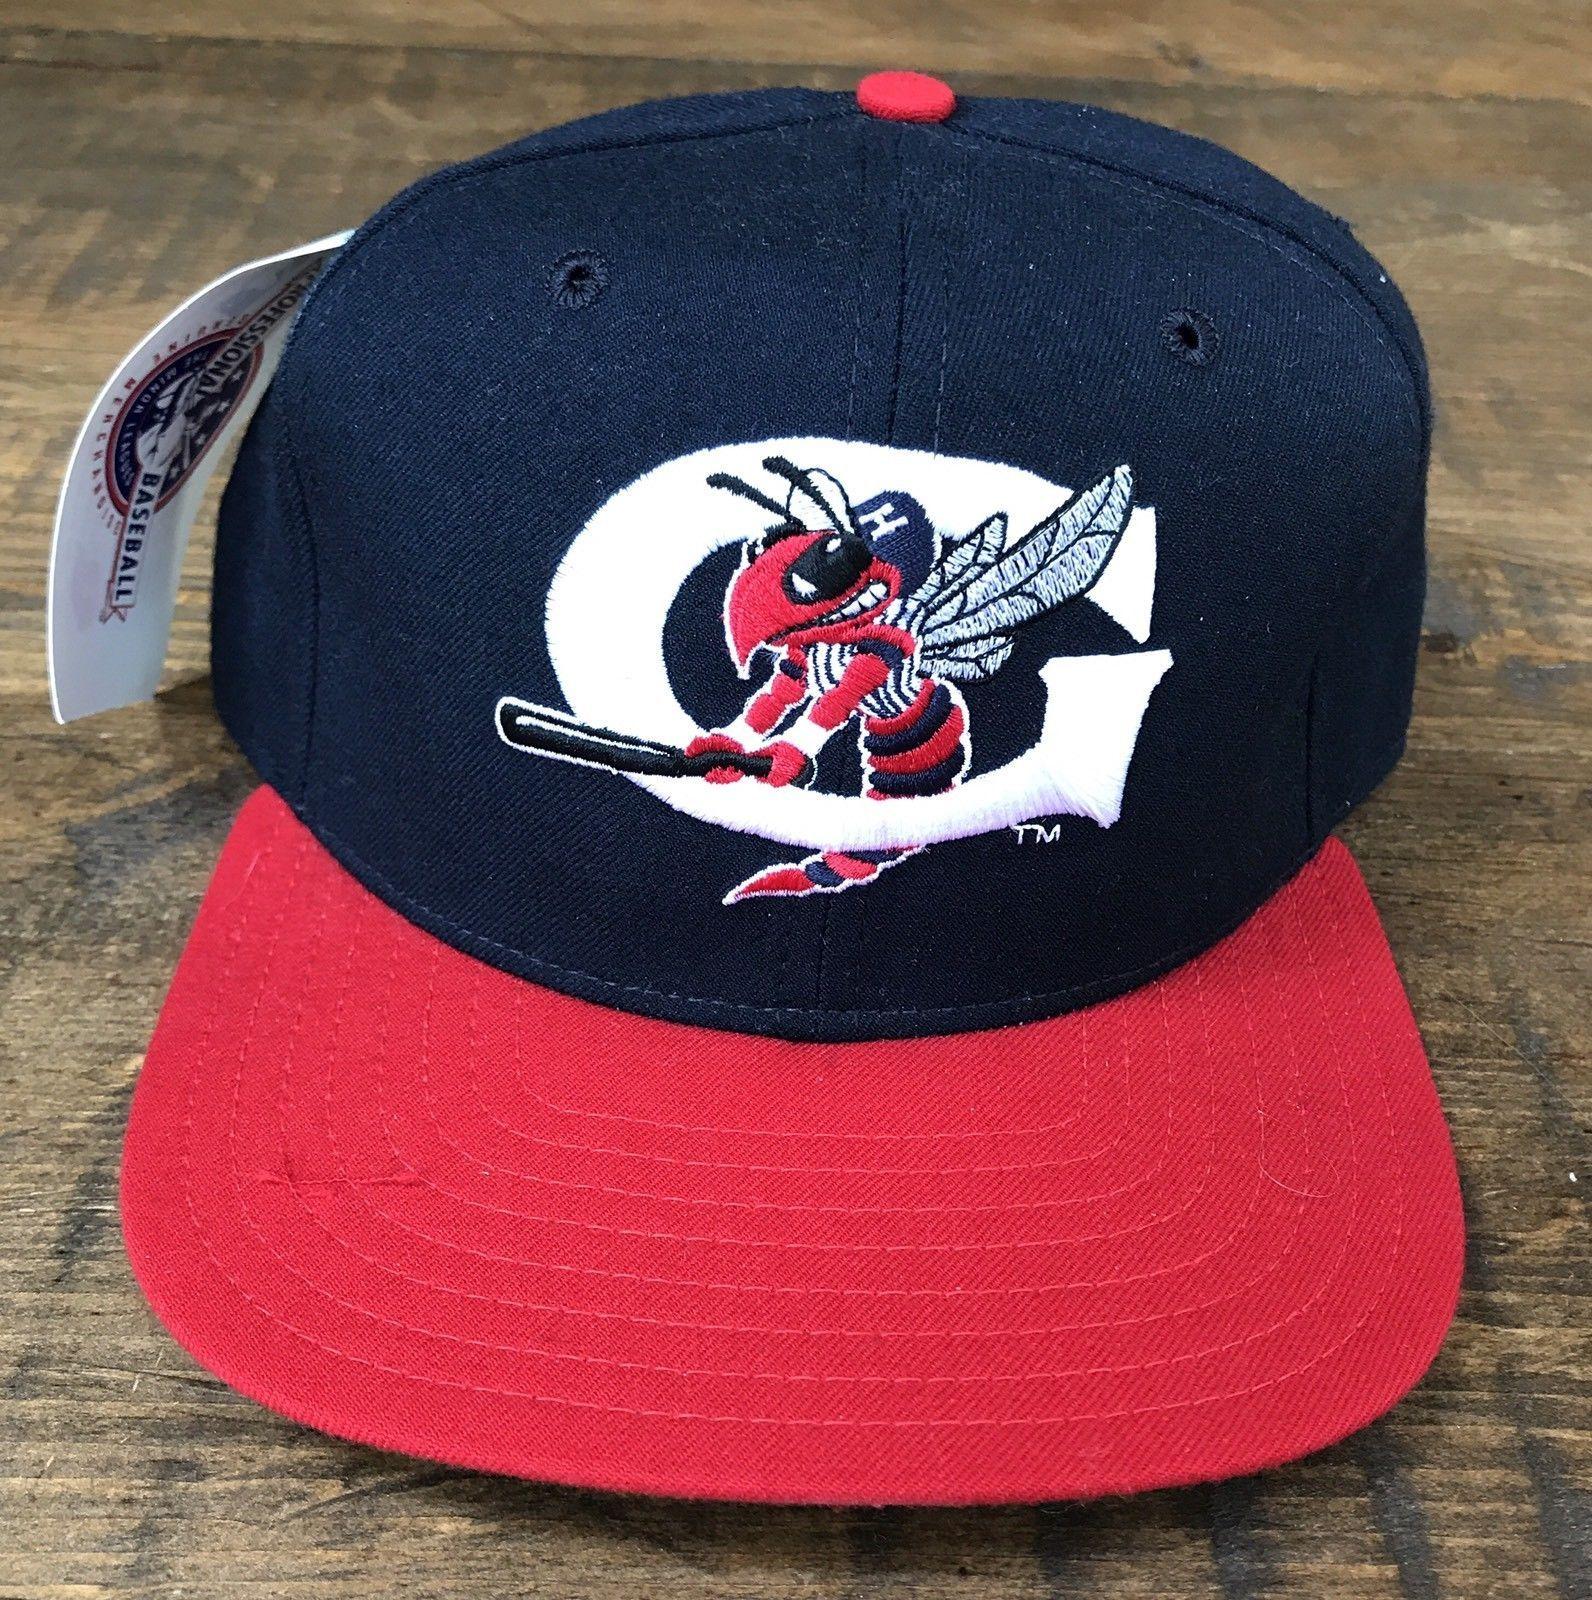 Vintage NEW NWT Greensboro Hornets New Era Snapback Hat Cap 90s Derek Jeter   8b95f6b1e97